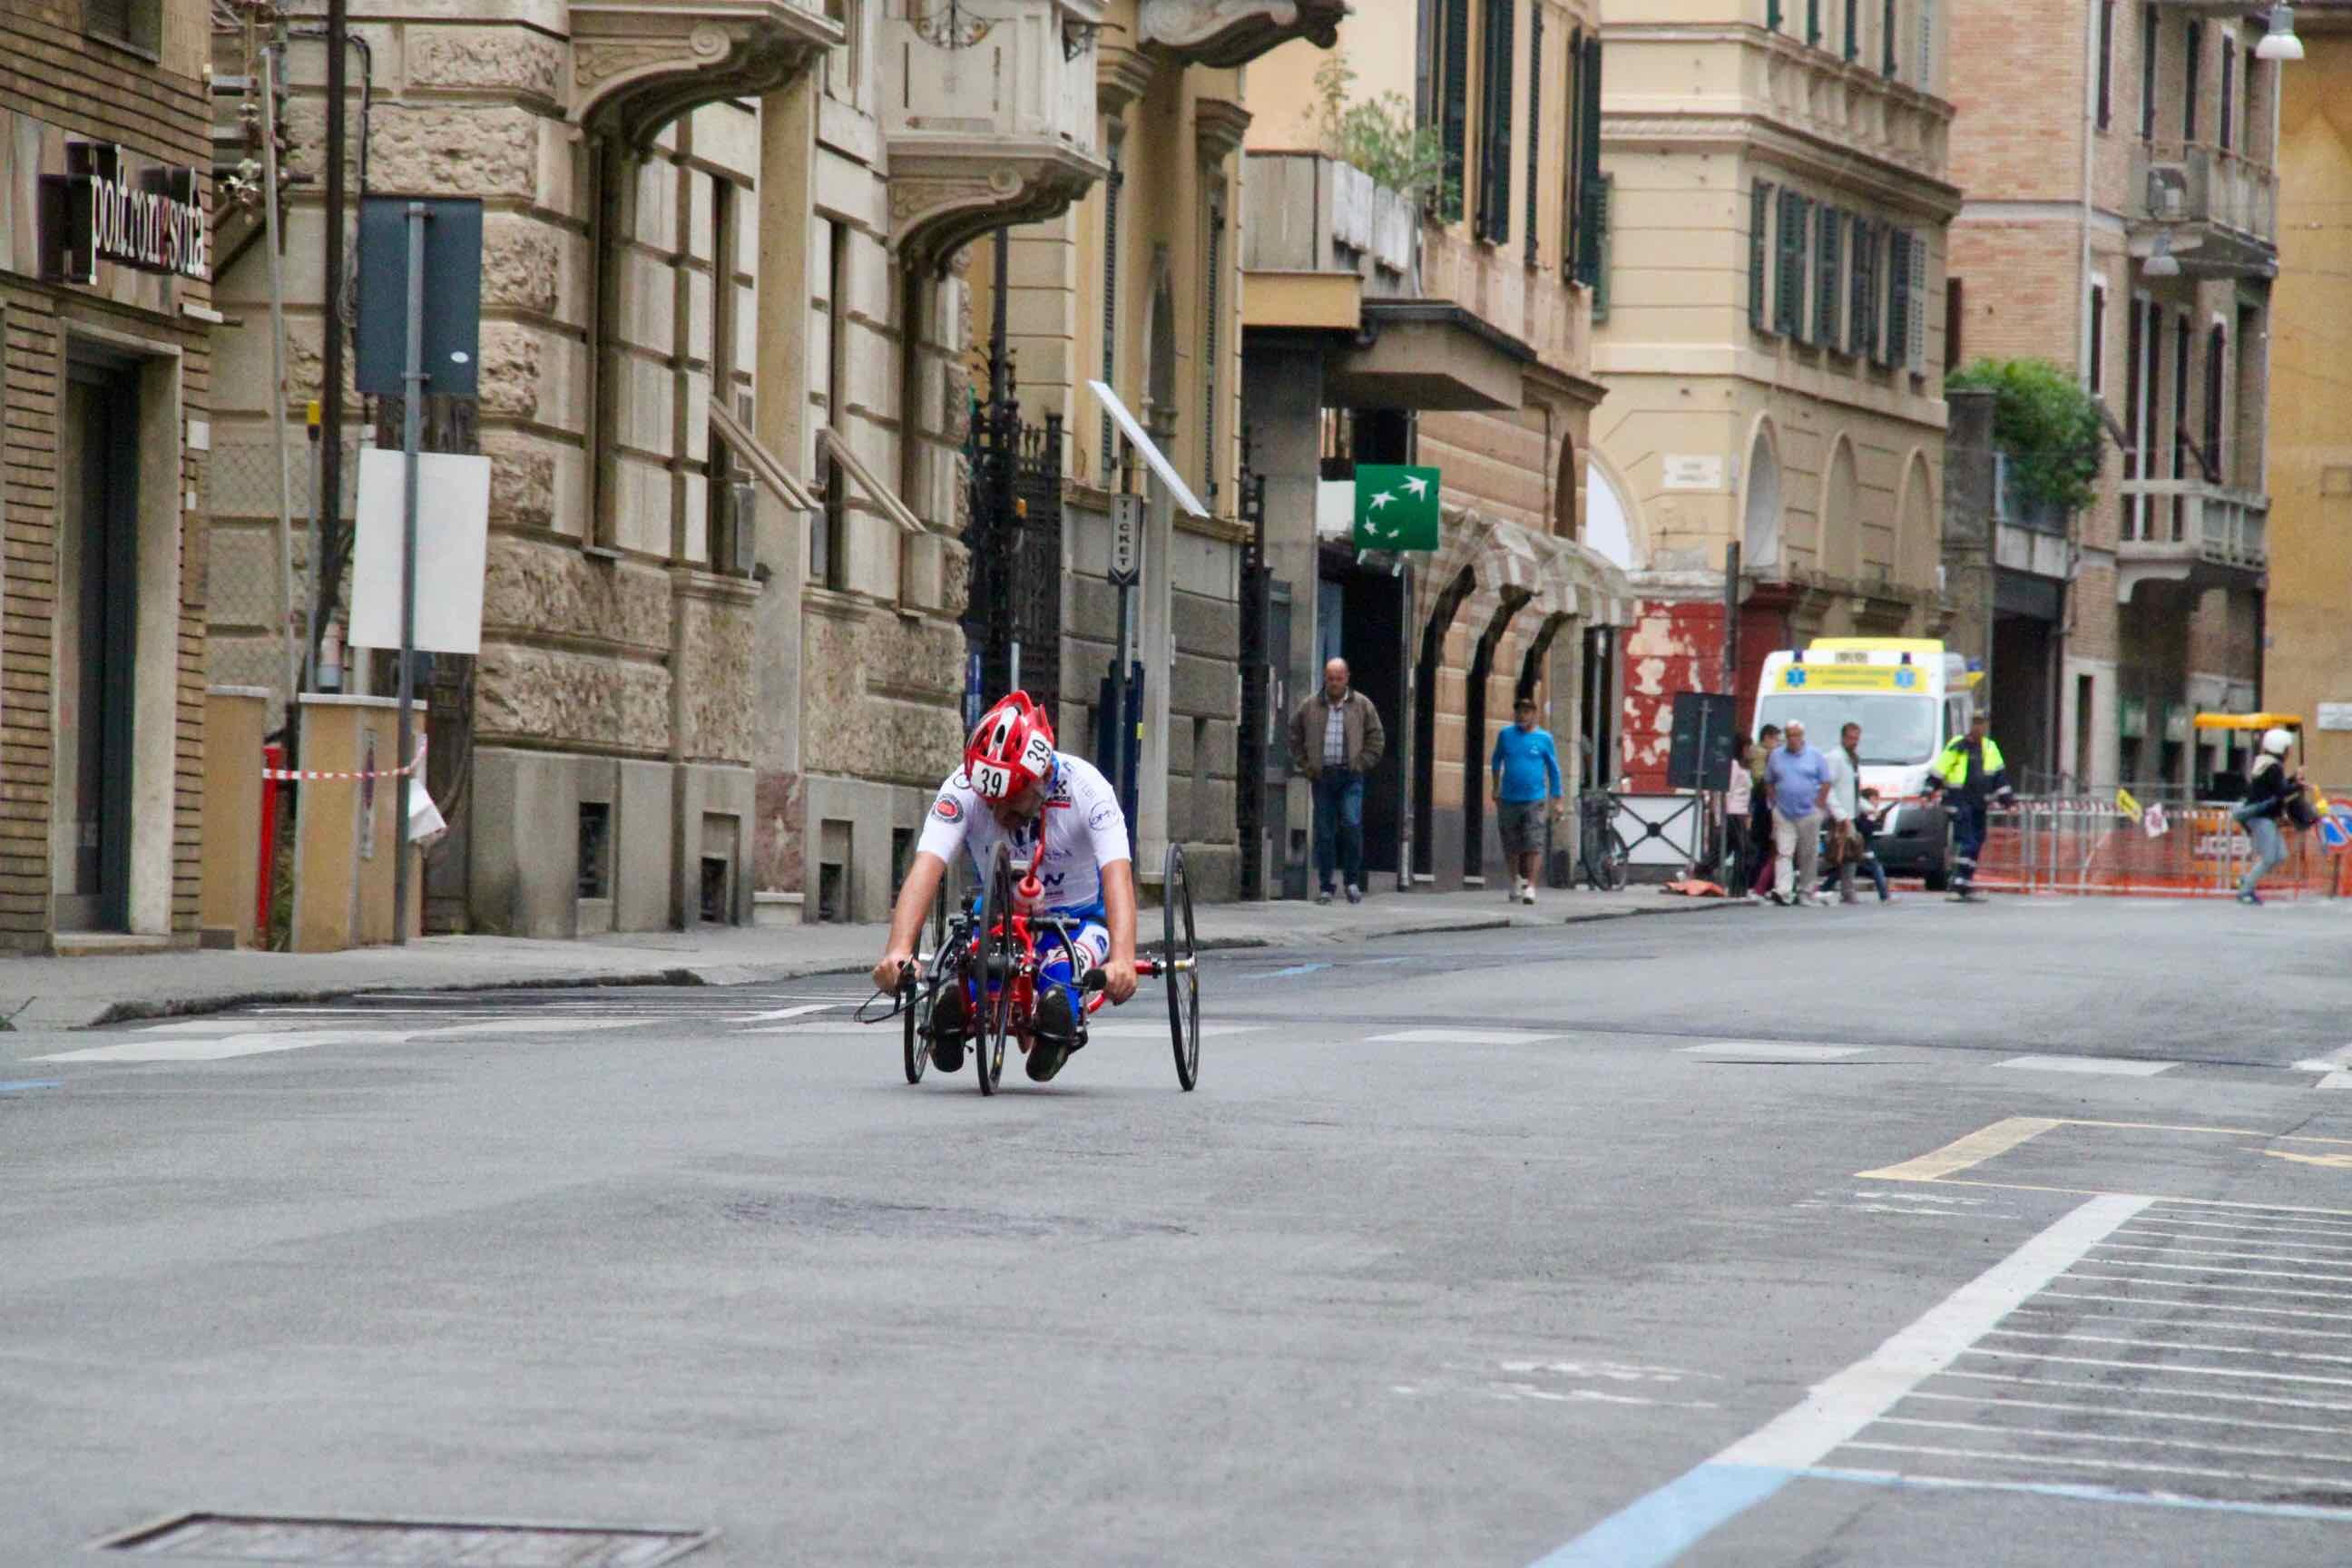 1° Memorial don Nando Negri a Chiavari per il Giro d'Italia Handbike 2018 - 7